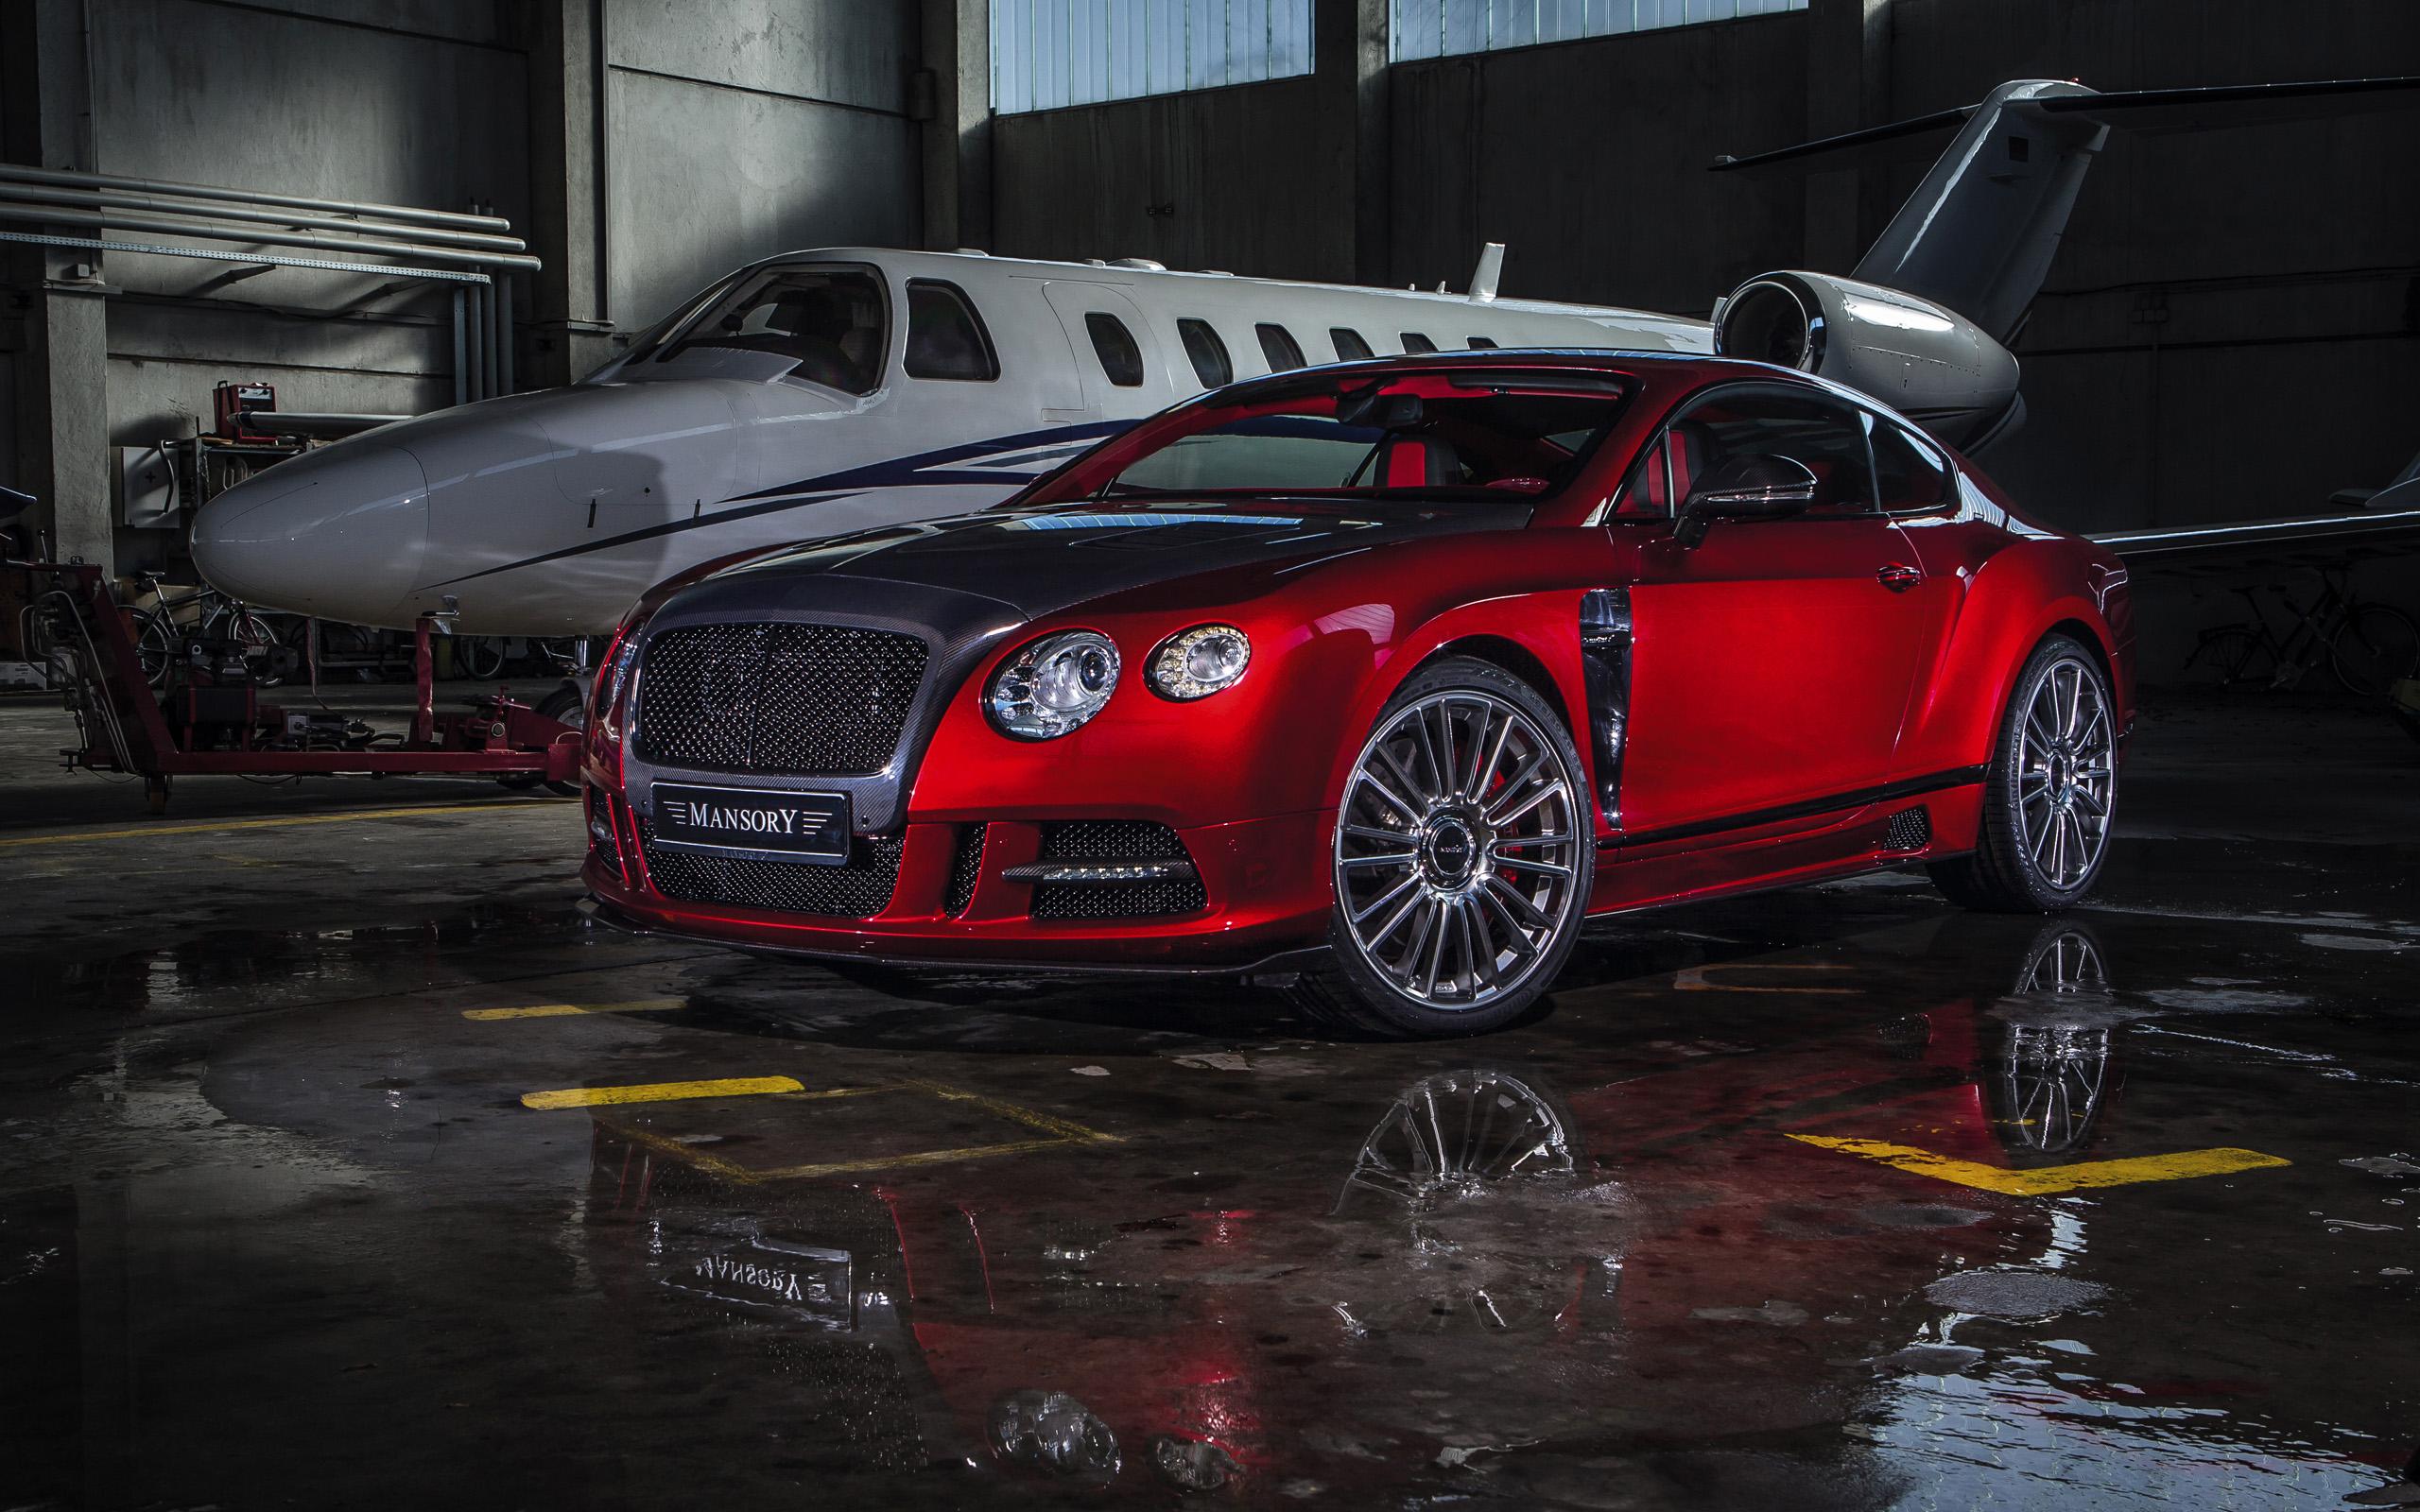 2013 Mansory Bentley Continental GT Sanguis Wallpaper